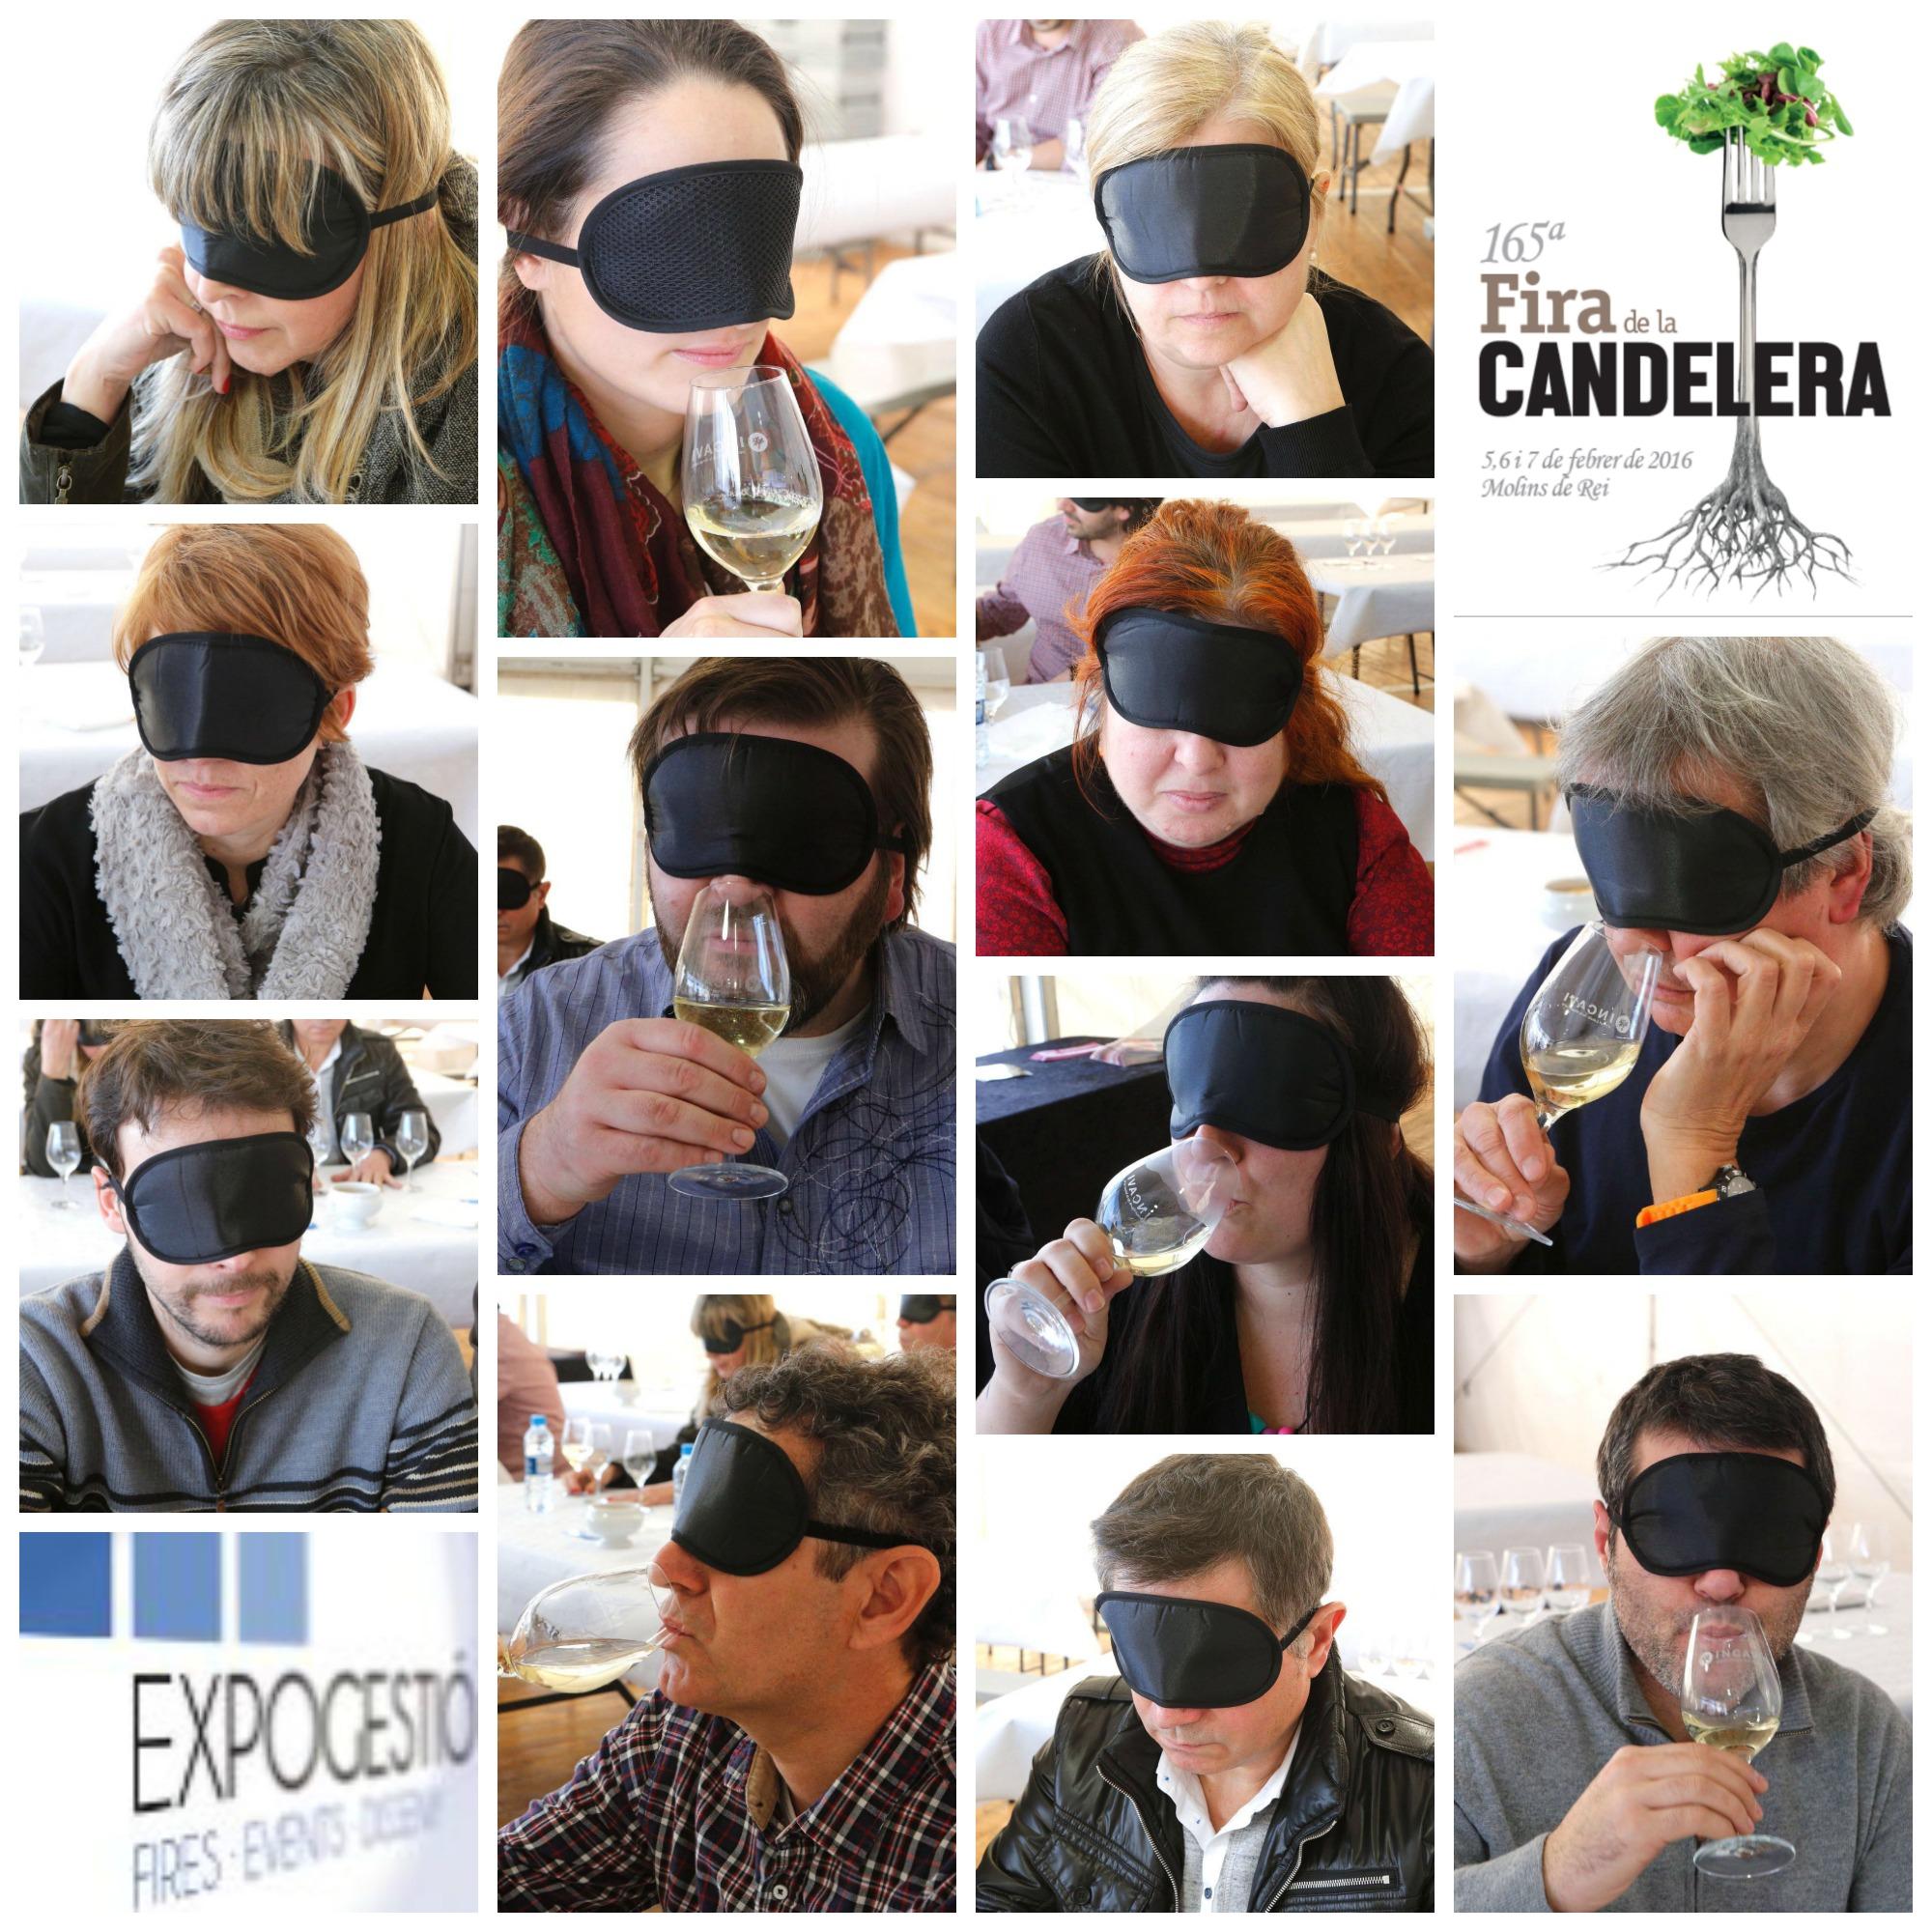 Blogaires a cegues candelera16